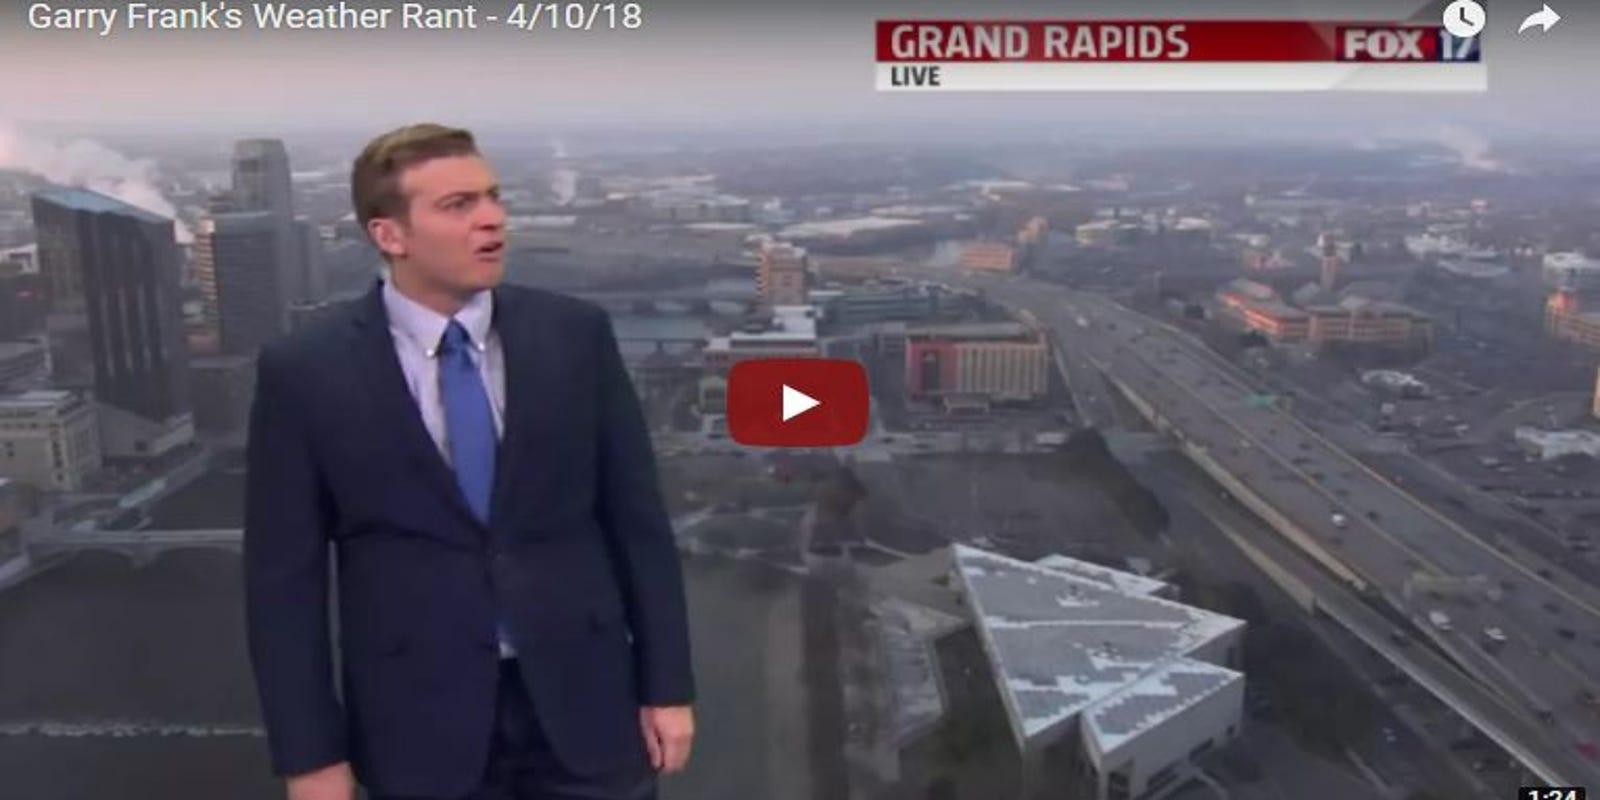 Grand Rapids weatherman's live rant goes viral